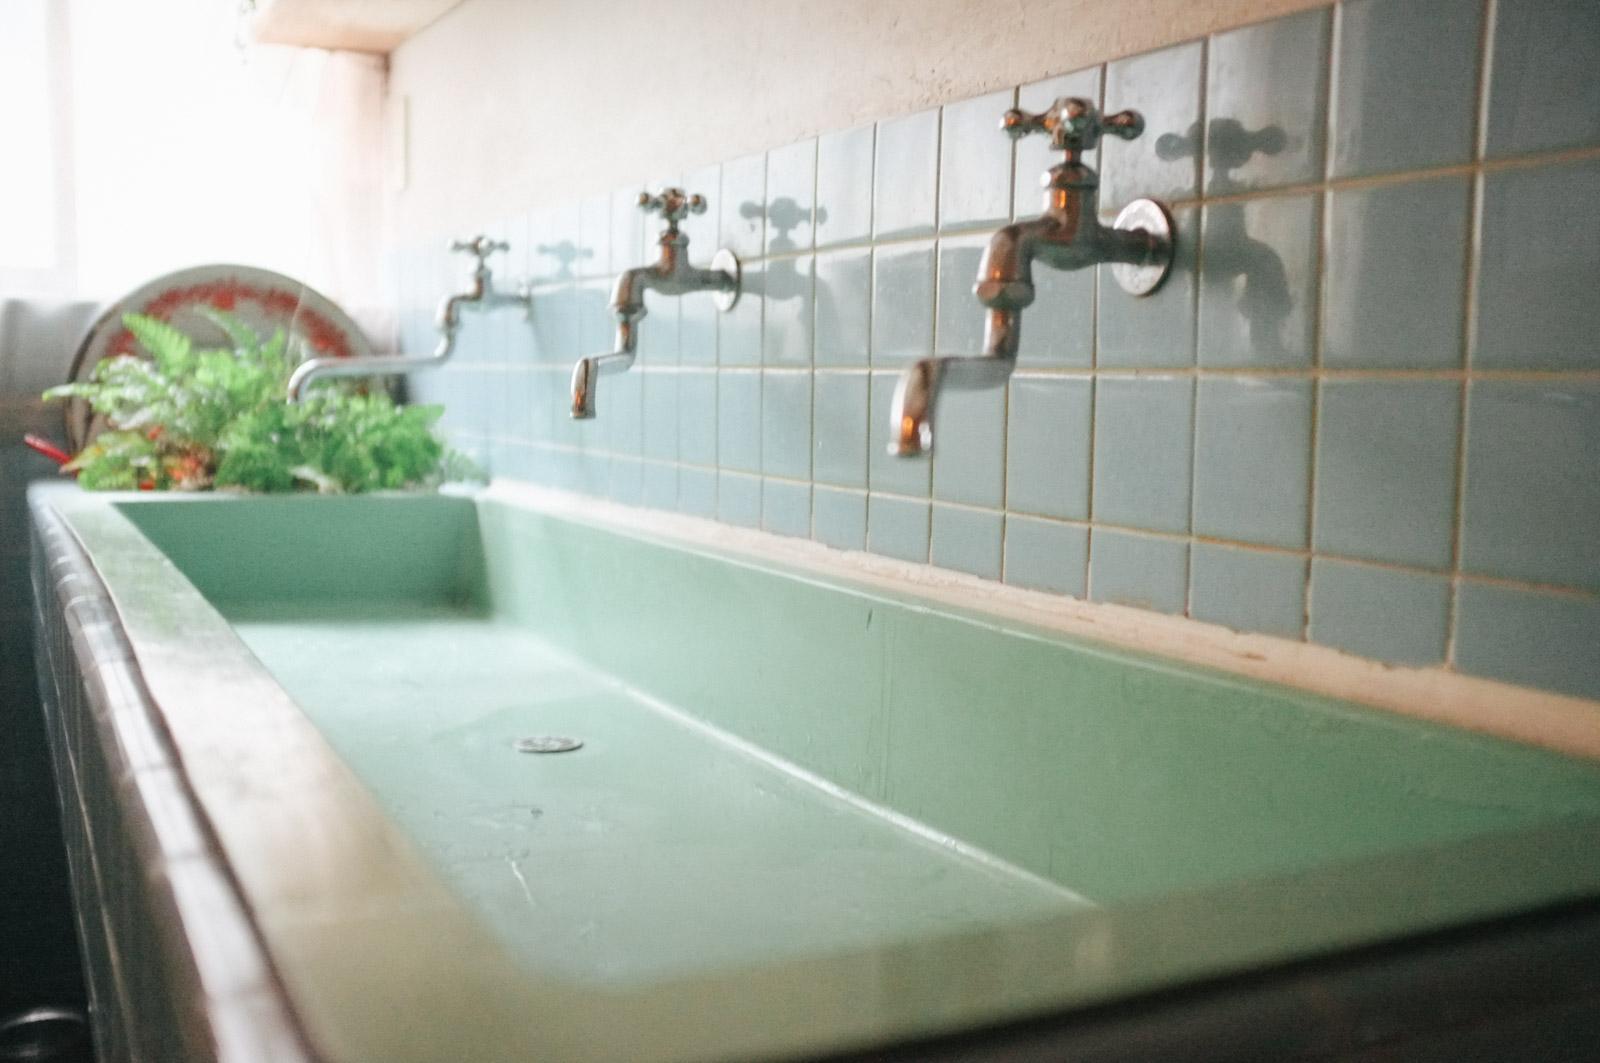 miki-airbnb-yado-004